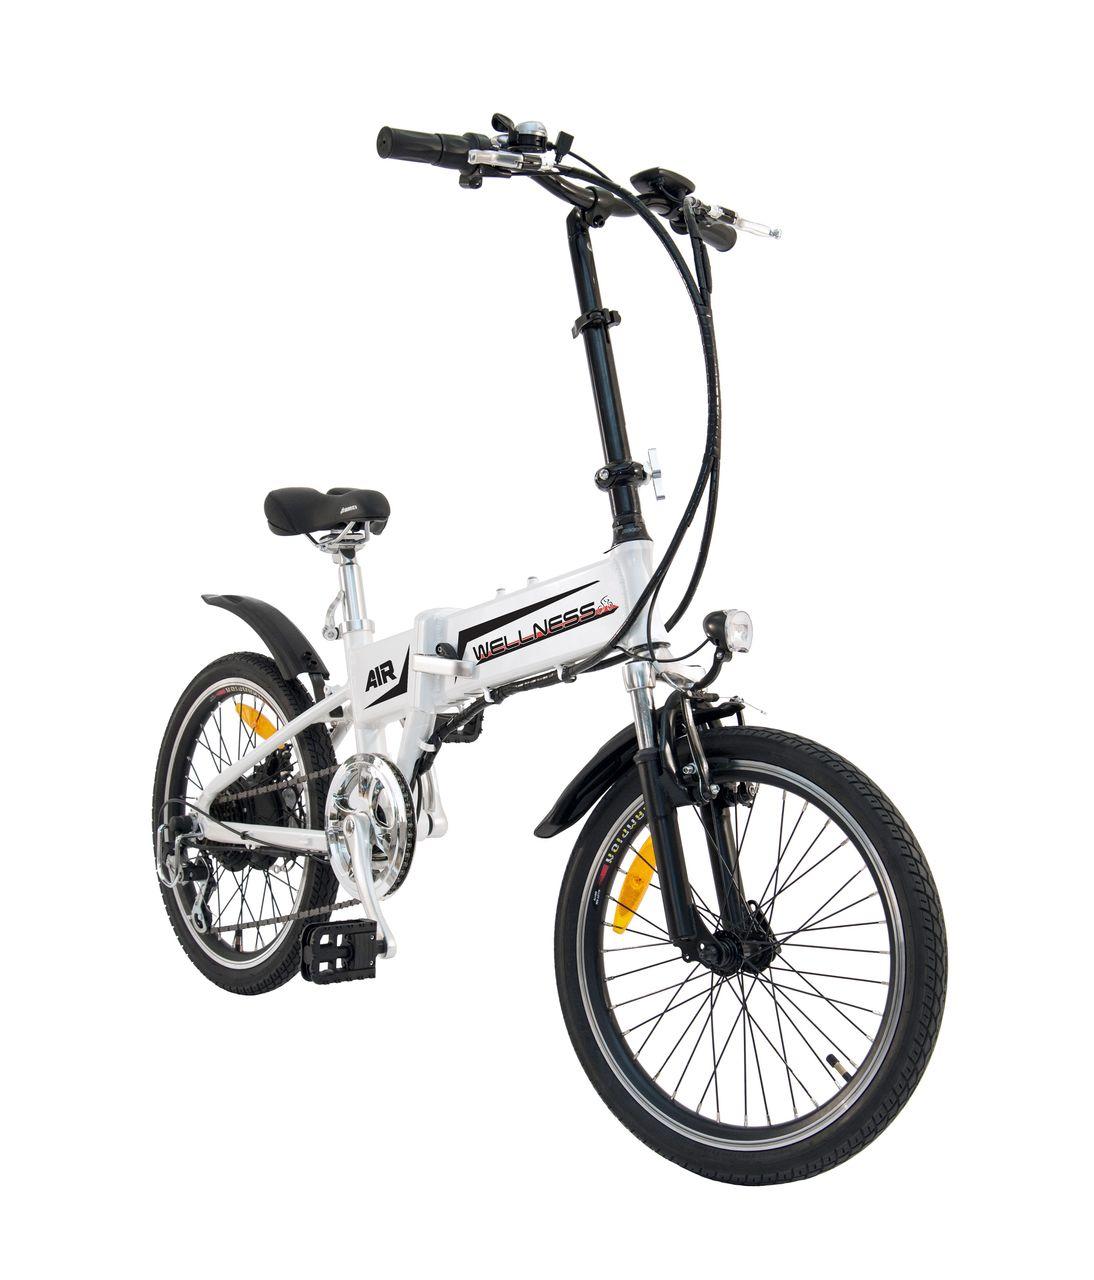 Электровелосипед WELLNESS Air 350-5